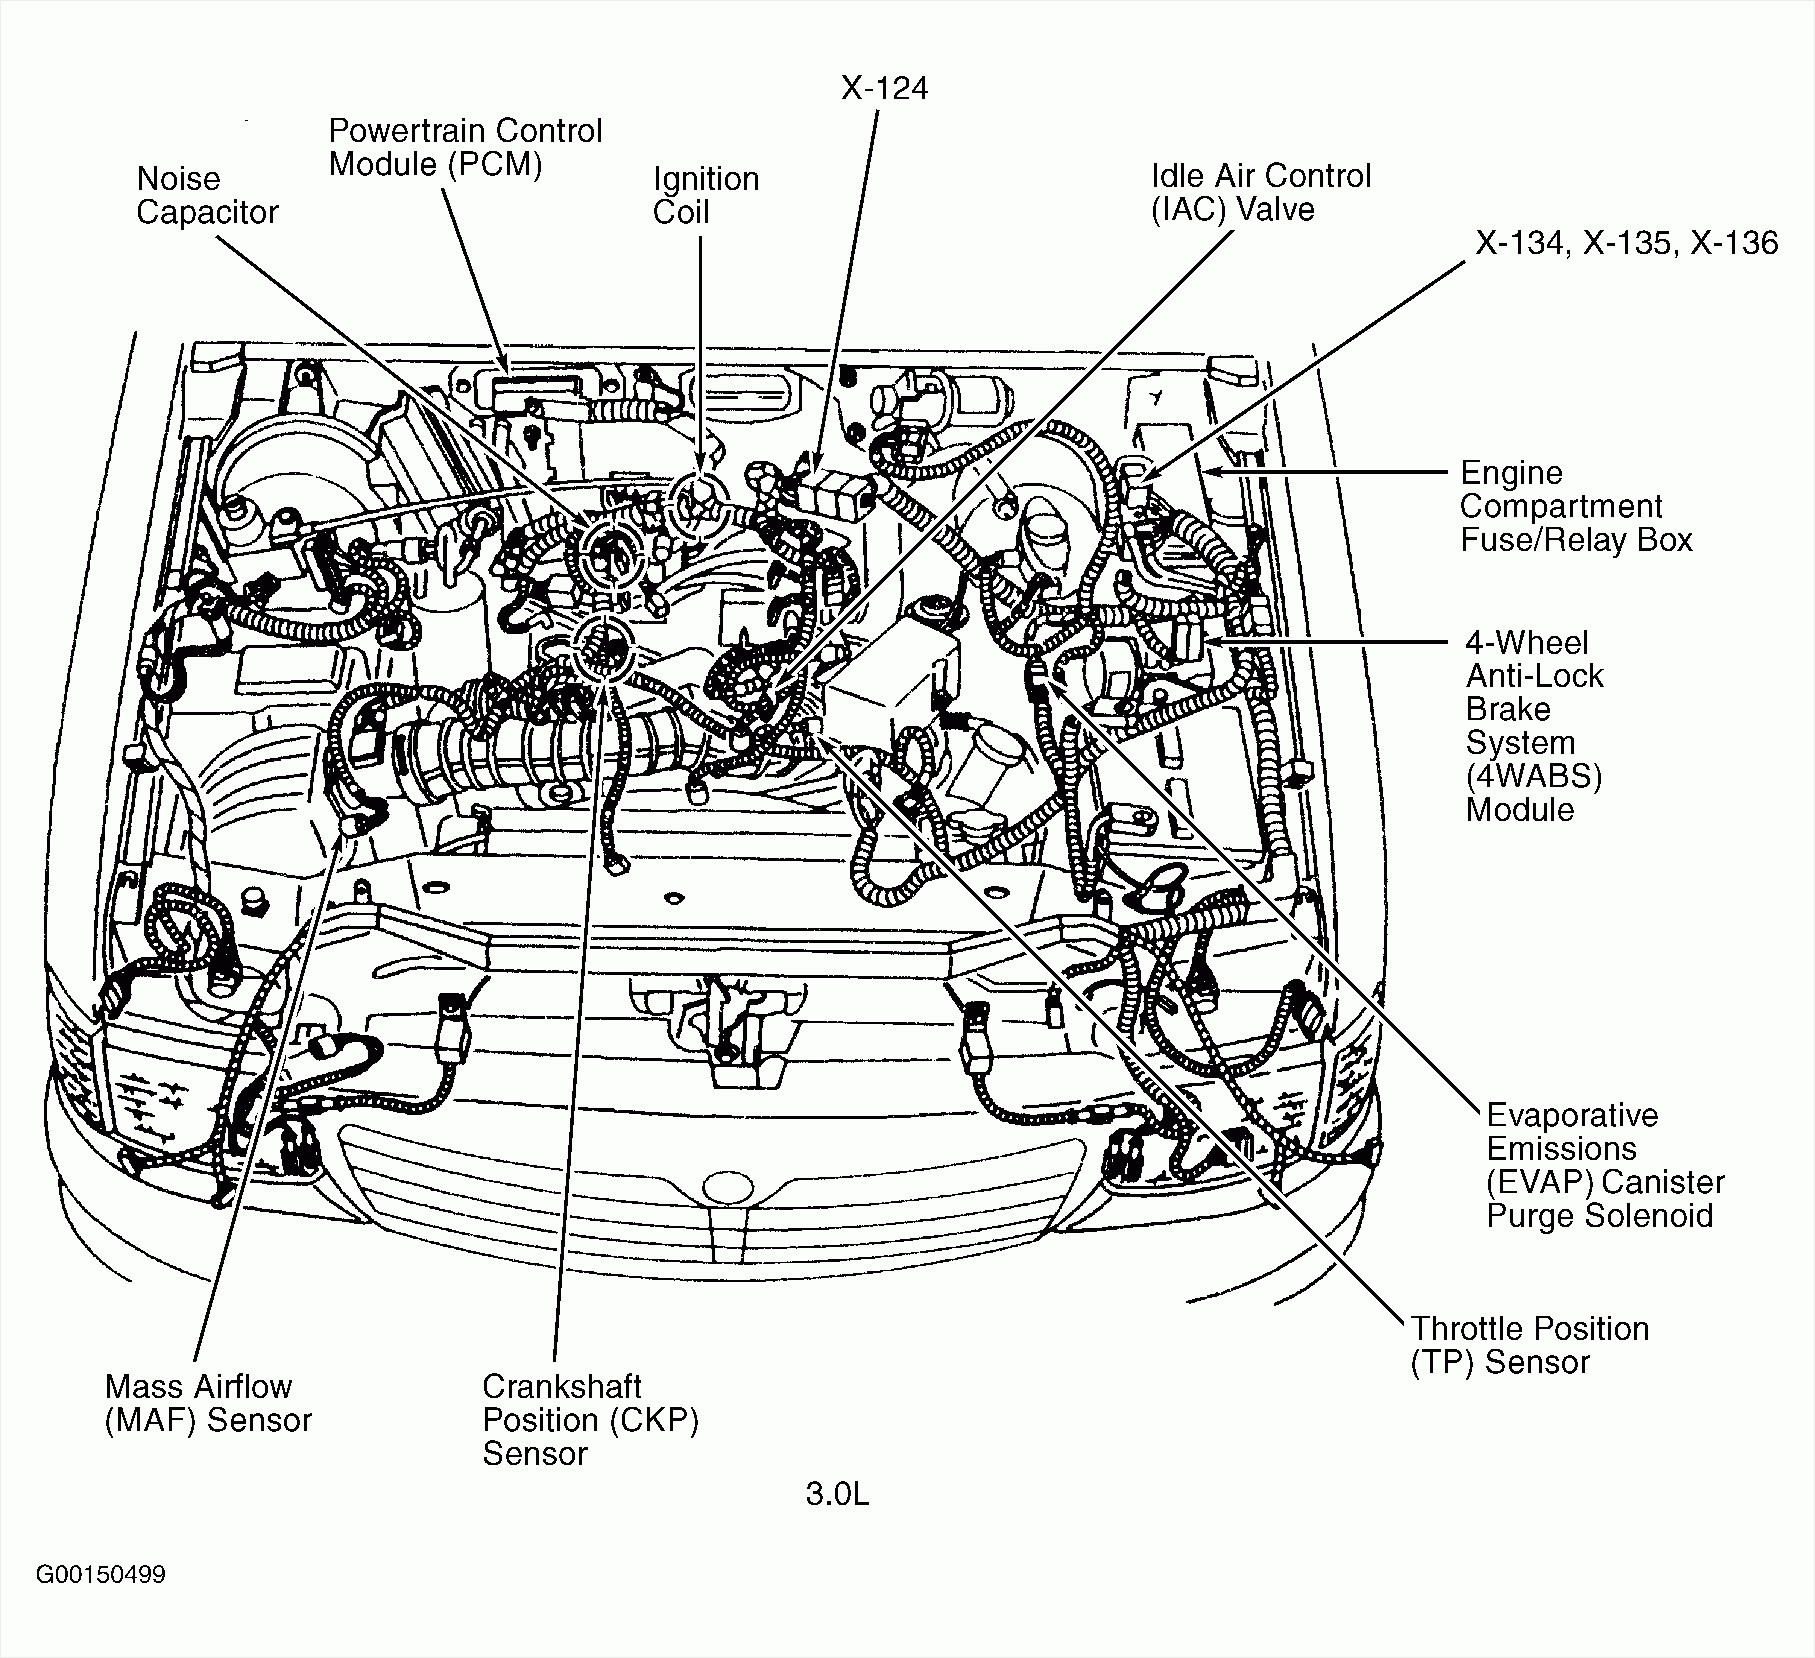 1998 ford Mustang Engine Diagram ford Ranger 3 0 V6 Engine Diagram ford Wiring Diagrams Instructions Of 1998 ford Mustang Engine Diagram